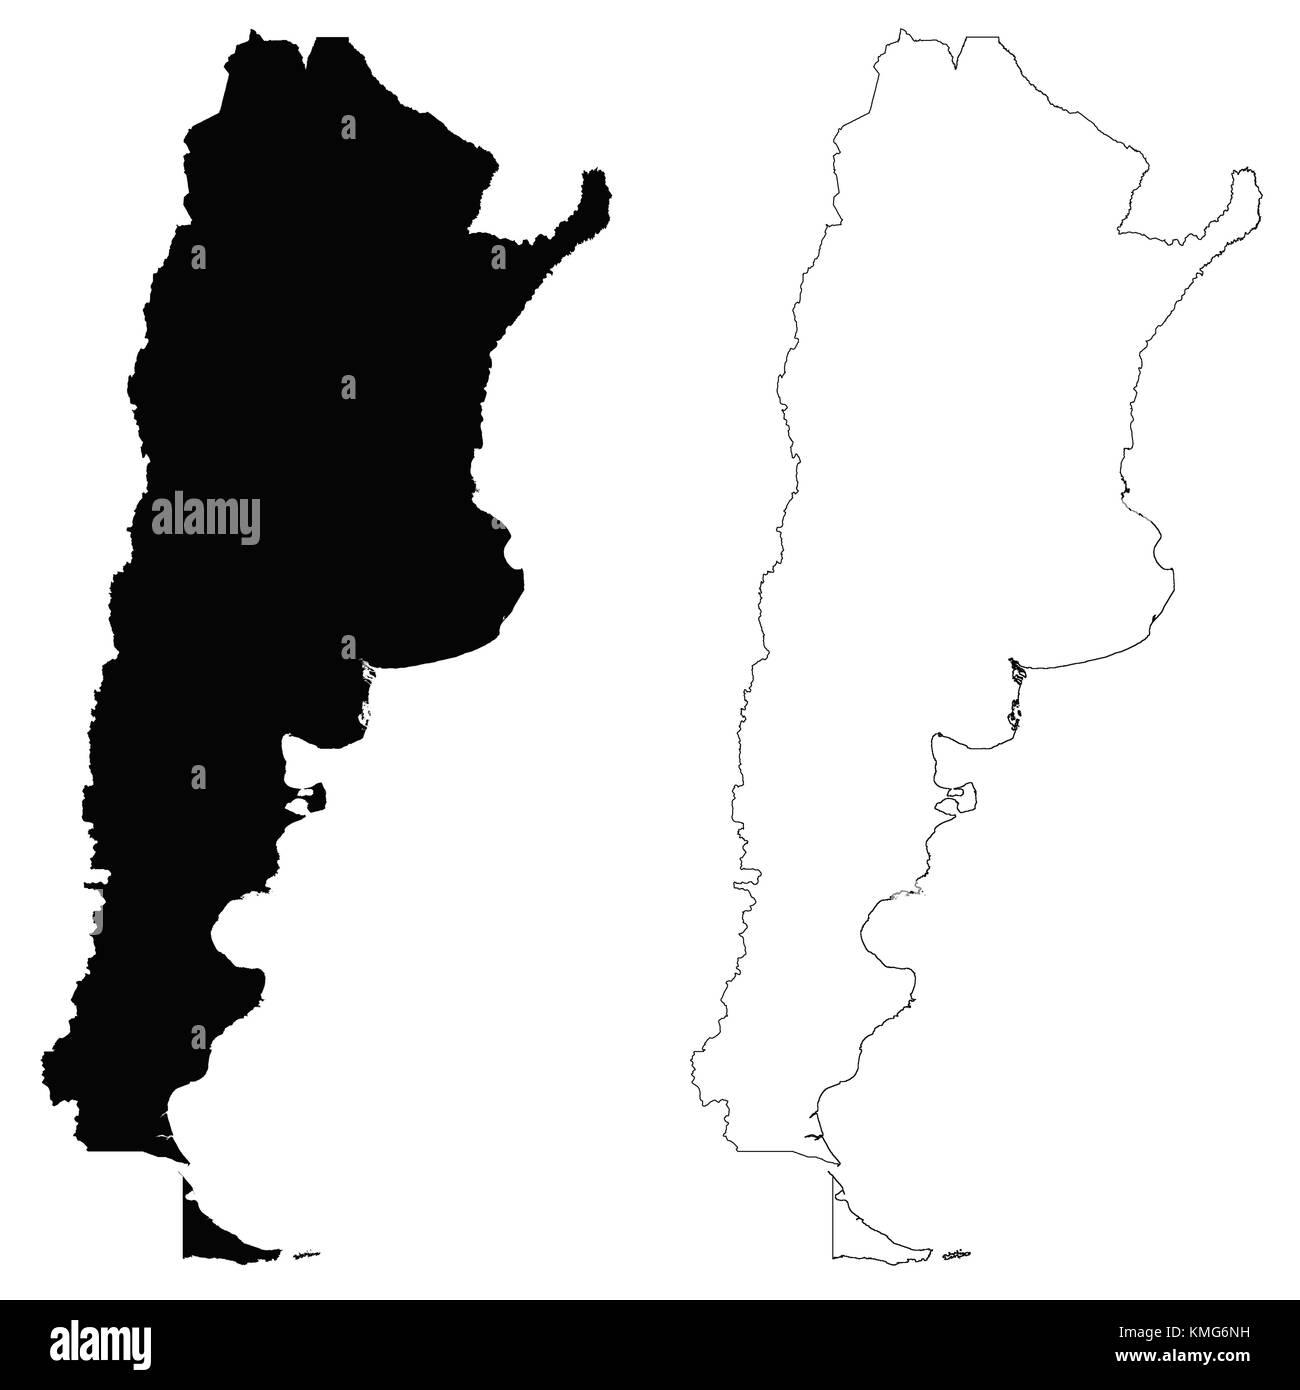 Argentina Map Outline Vector Stock Photos Argentina Map Outline - Argentina map outline